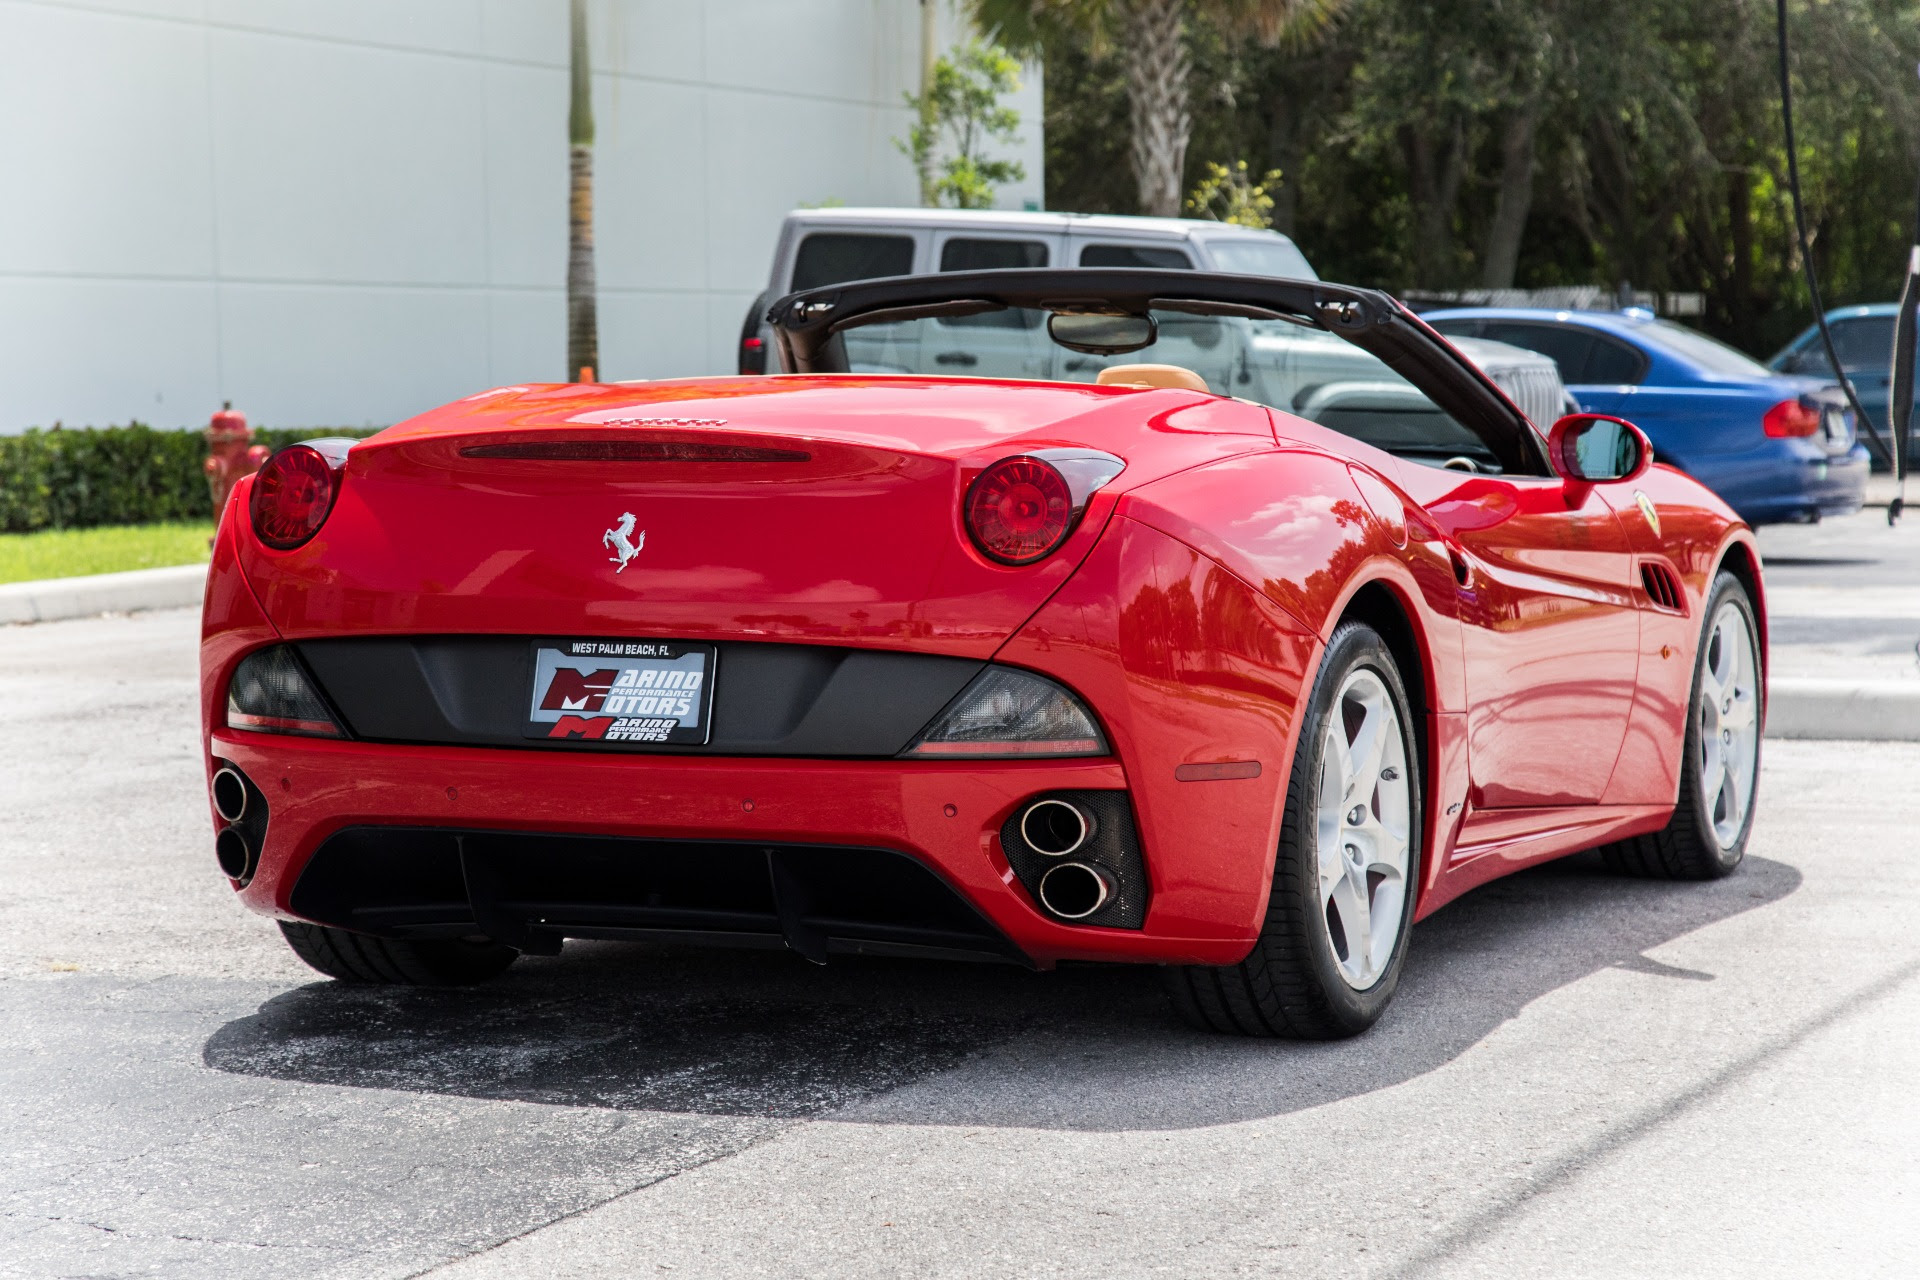 Used 2009 Ferrari California For Sale ($94,900) | Marino ...